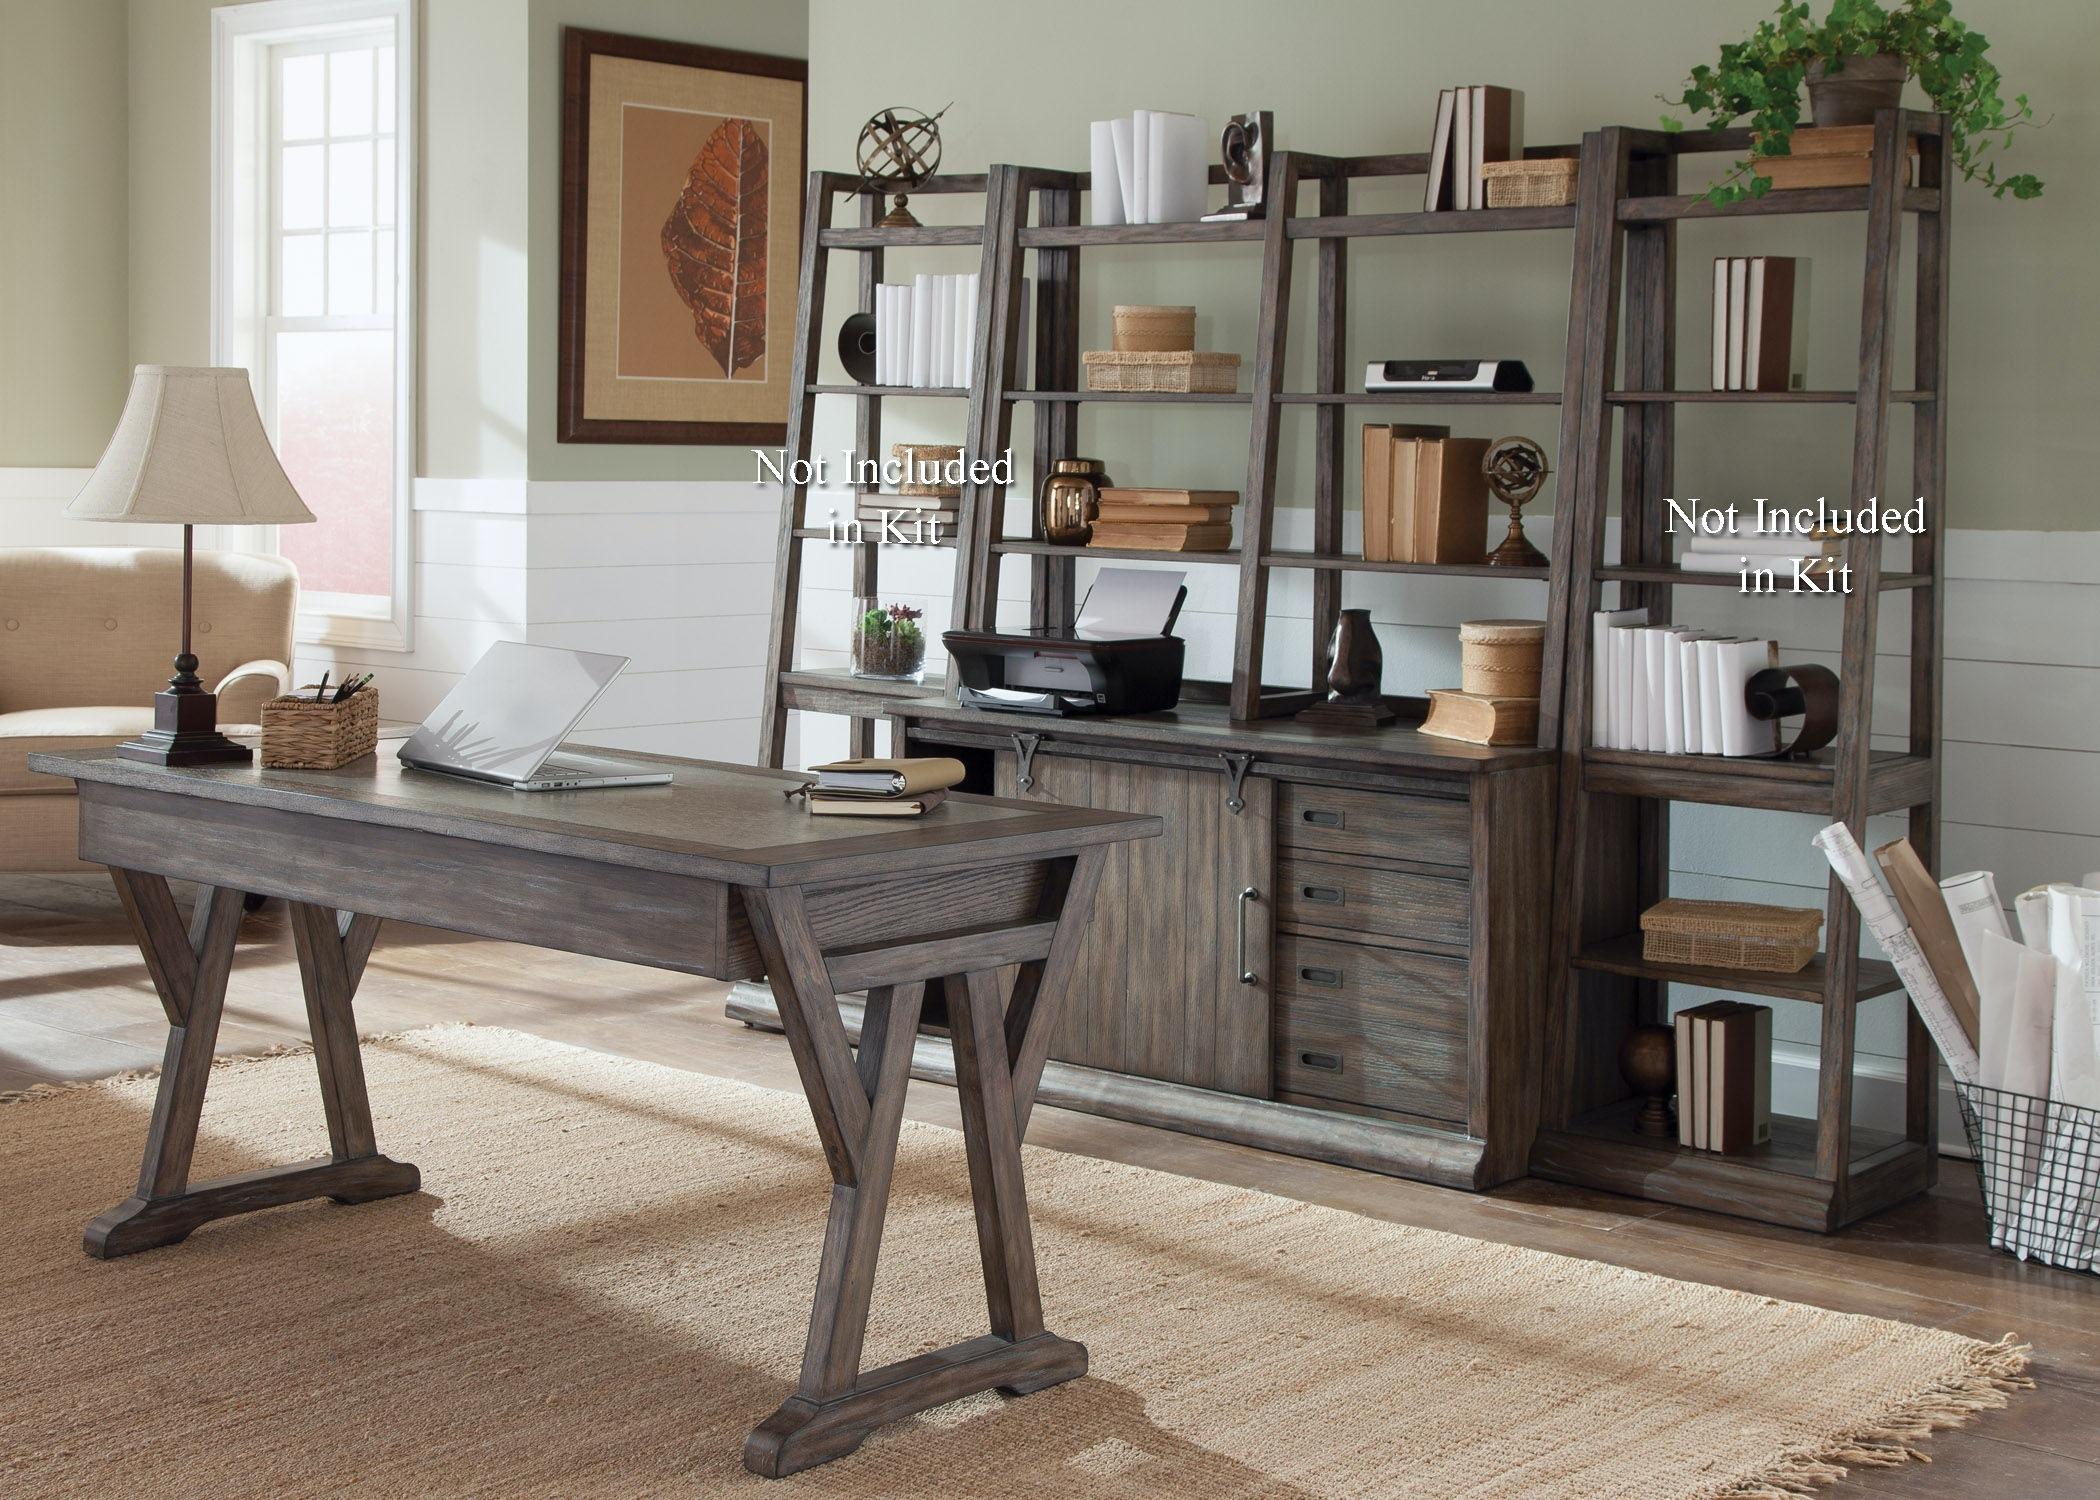 cds furniture. Liberty Furniture Complete Desk 466-HOJ-CDS Cds